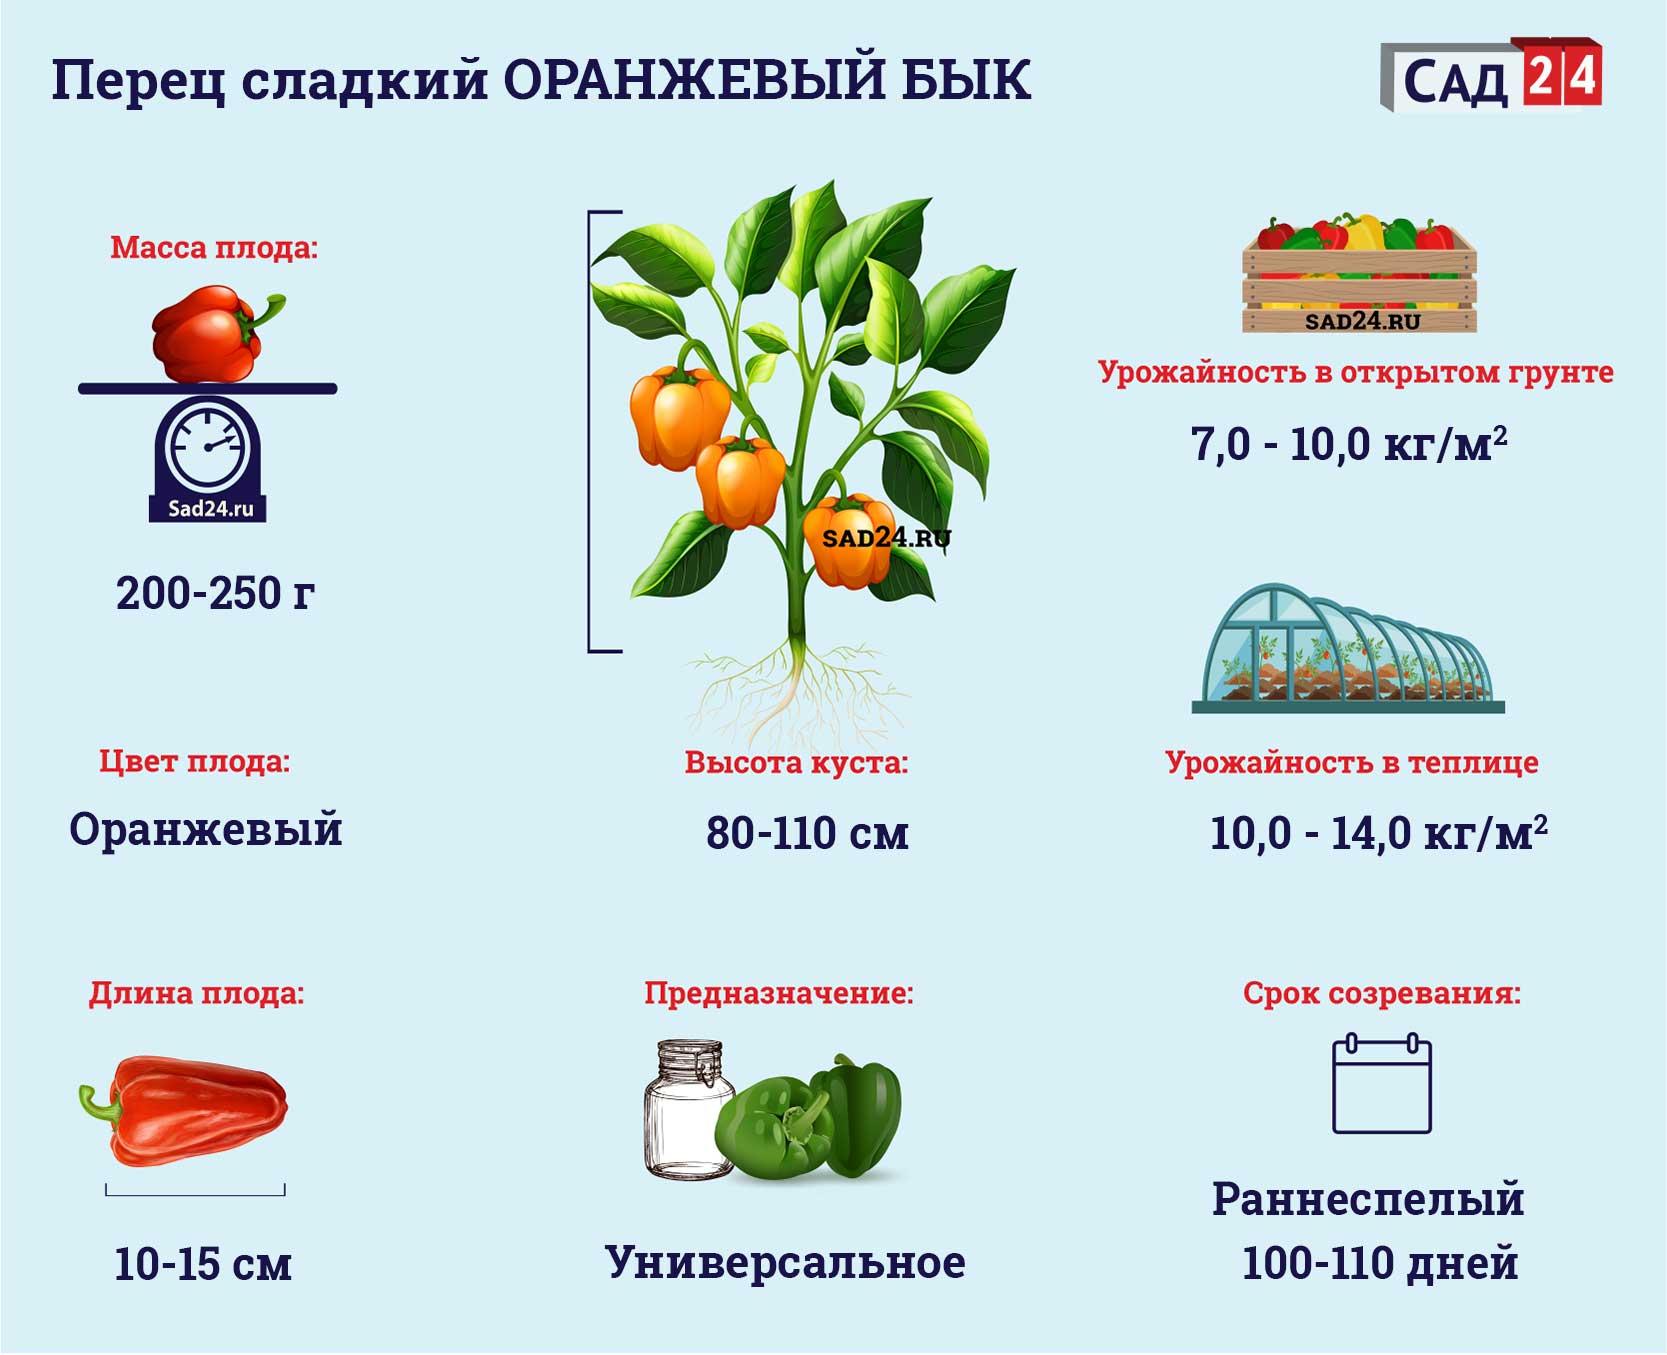 Оранжевый бык - https://sad24.ru